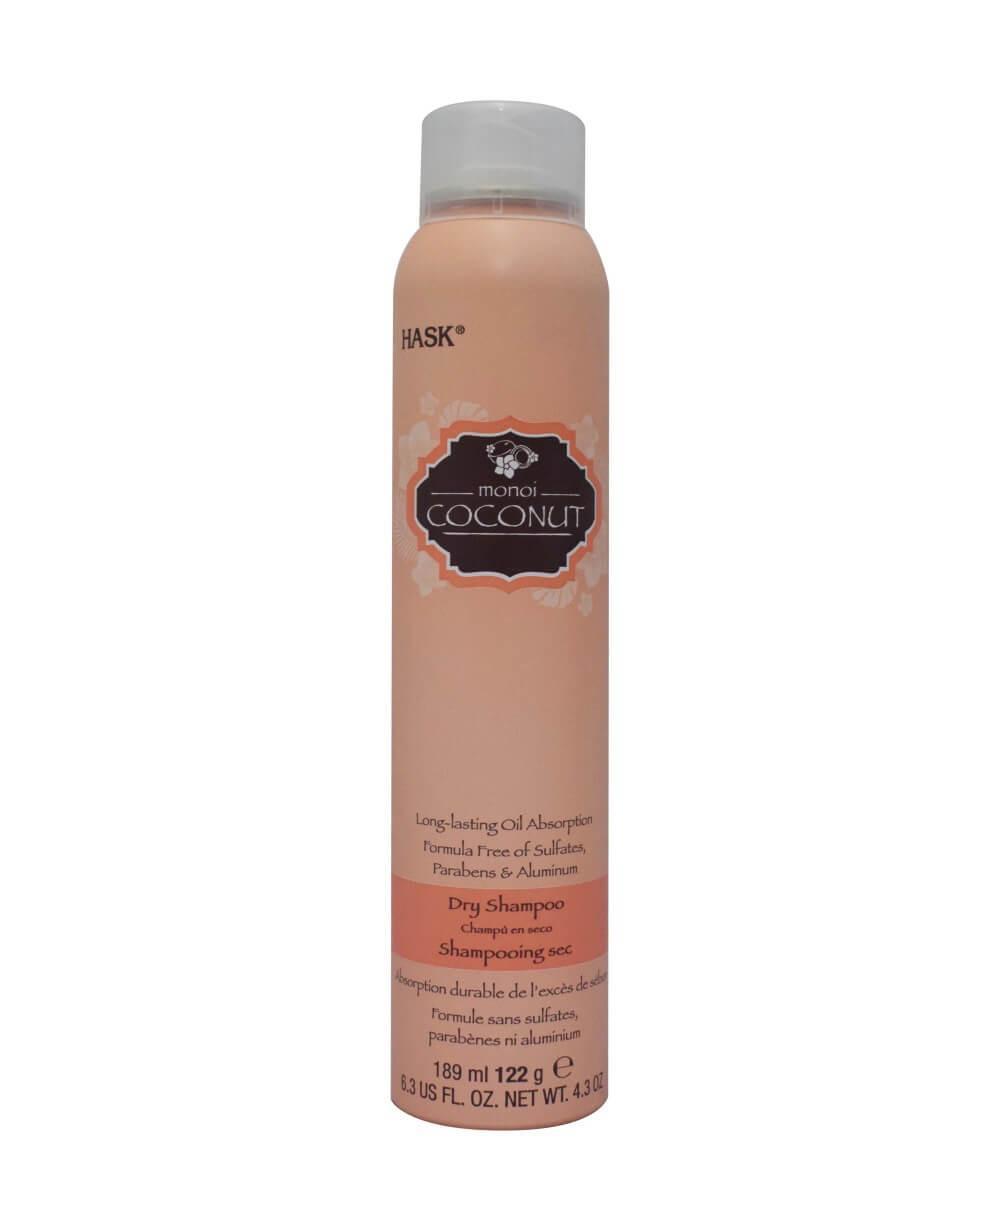 Hask Coconut Dry Shampoo 122g